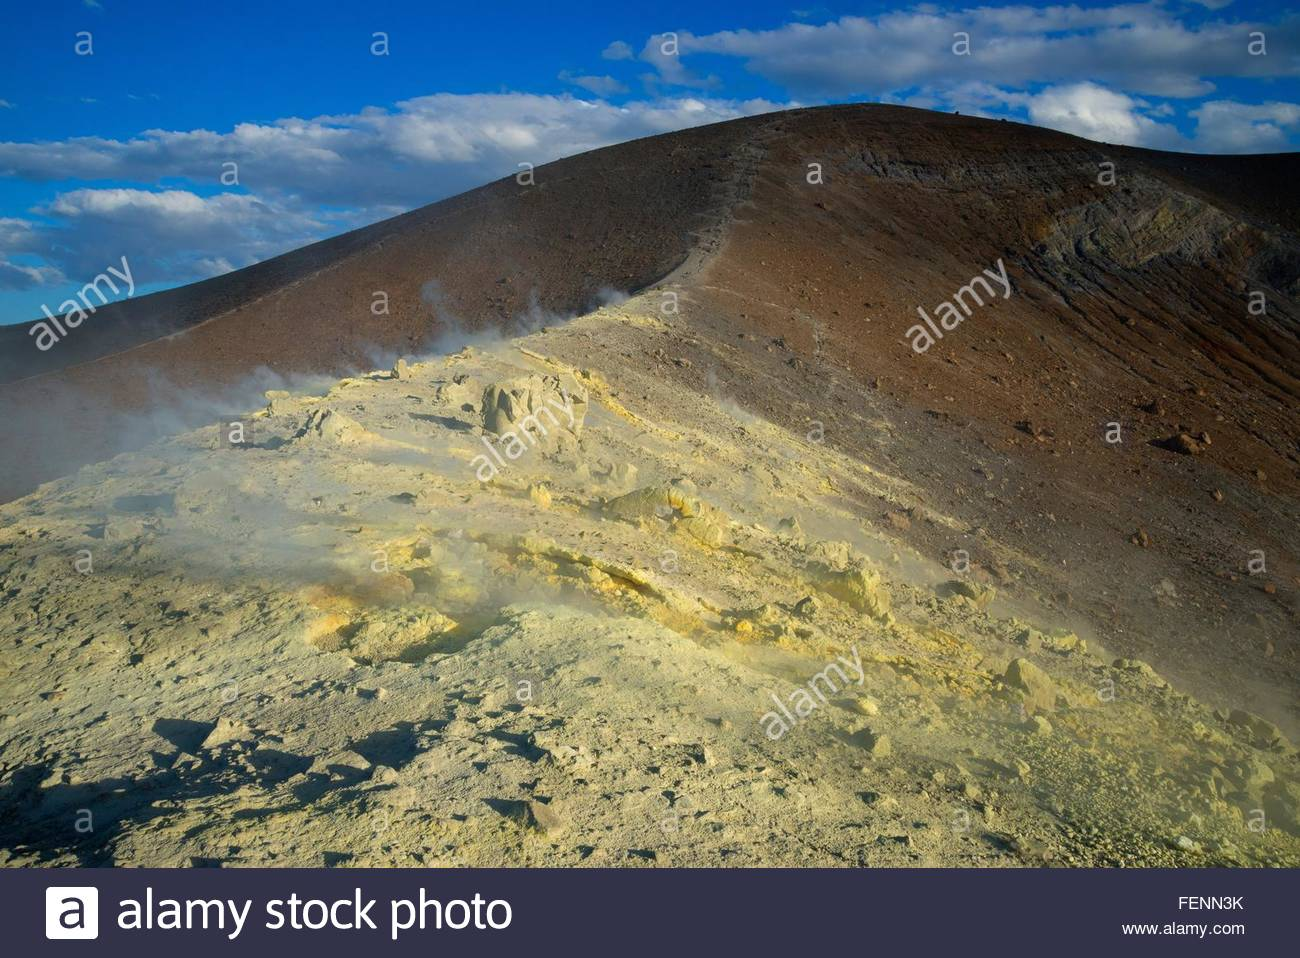 Schwefel und Fumarole Rauch am Gran Cratere Vulcano Insel Äolischen Inseln, Sizilien, Italien Stockbild